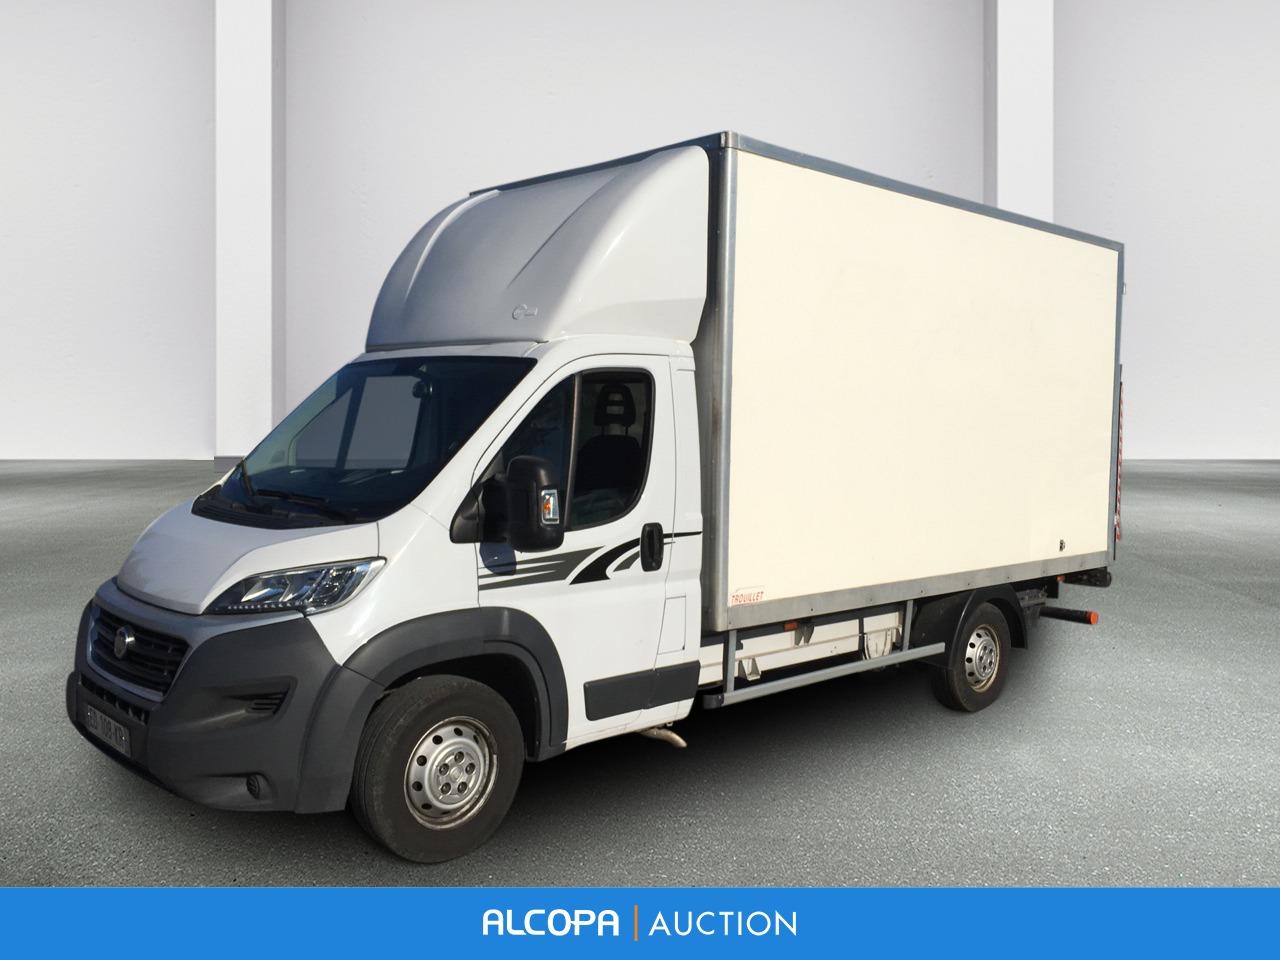 fiat ducato chassis cabine ducato cc maxi 2 3 mjt 130 pack pro nav caisse 20 m3 hayon alcopa. Black Bedroom Furniture Sets. Home Design Ideas